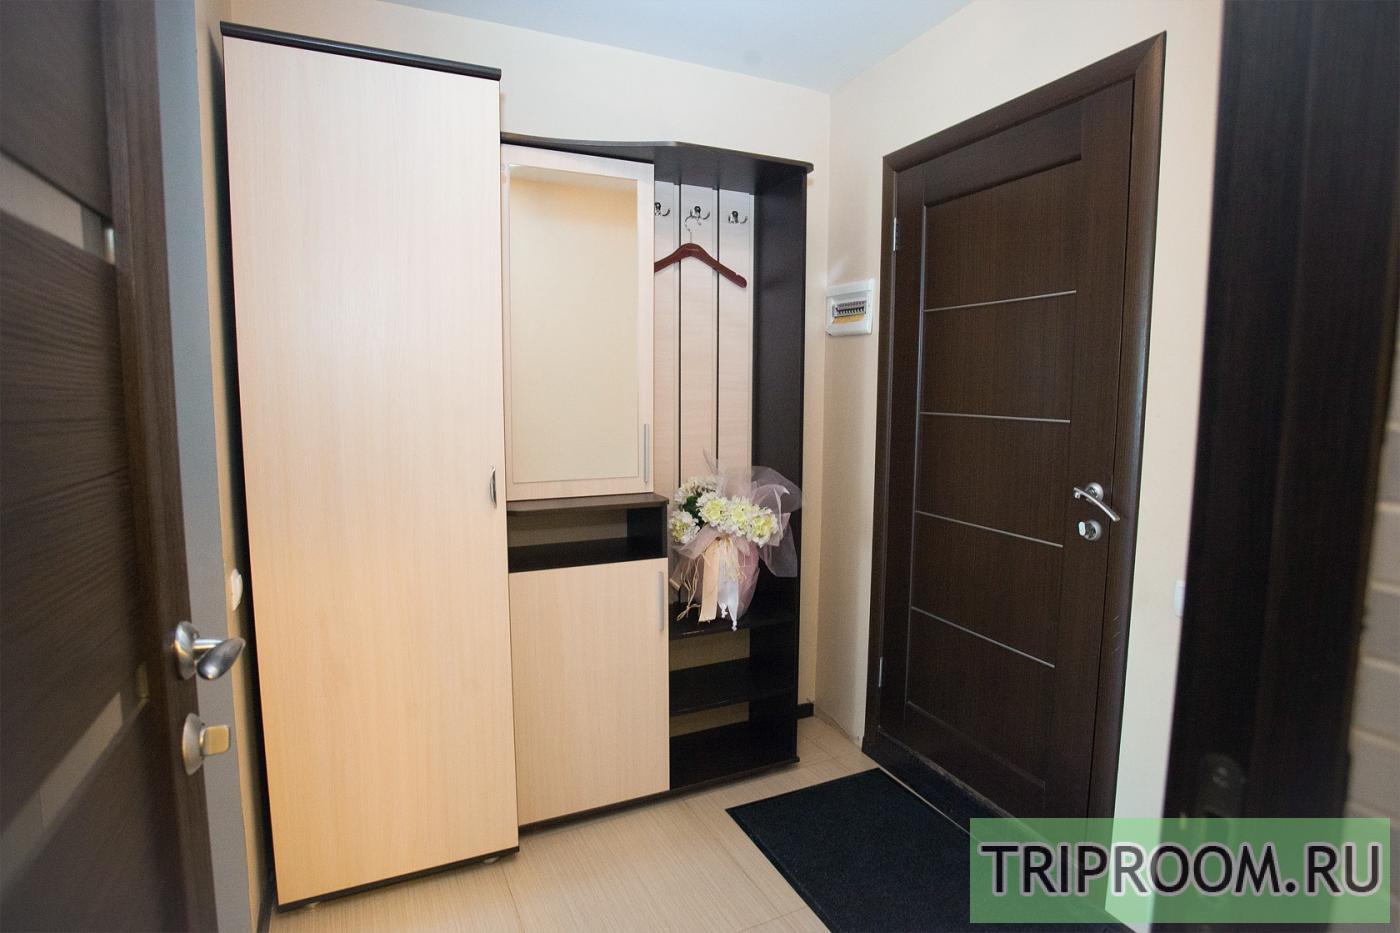 1-комнатная квартира посуточно (вариант № 30226), ул. Кирова проспект, фото № 11